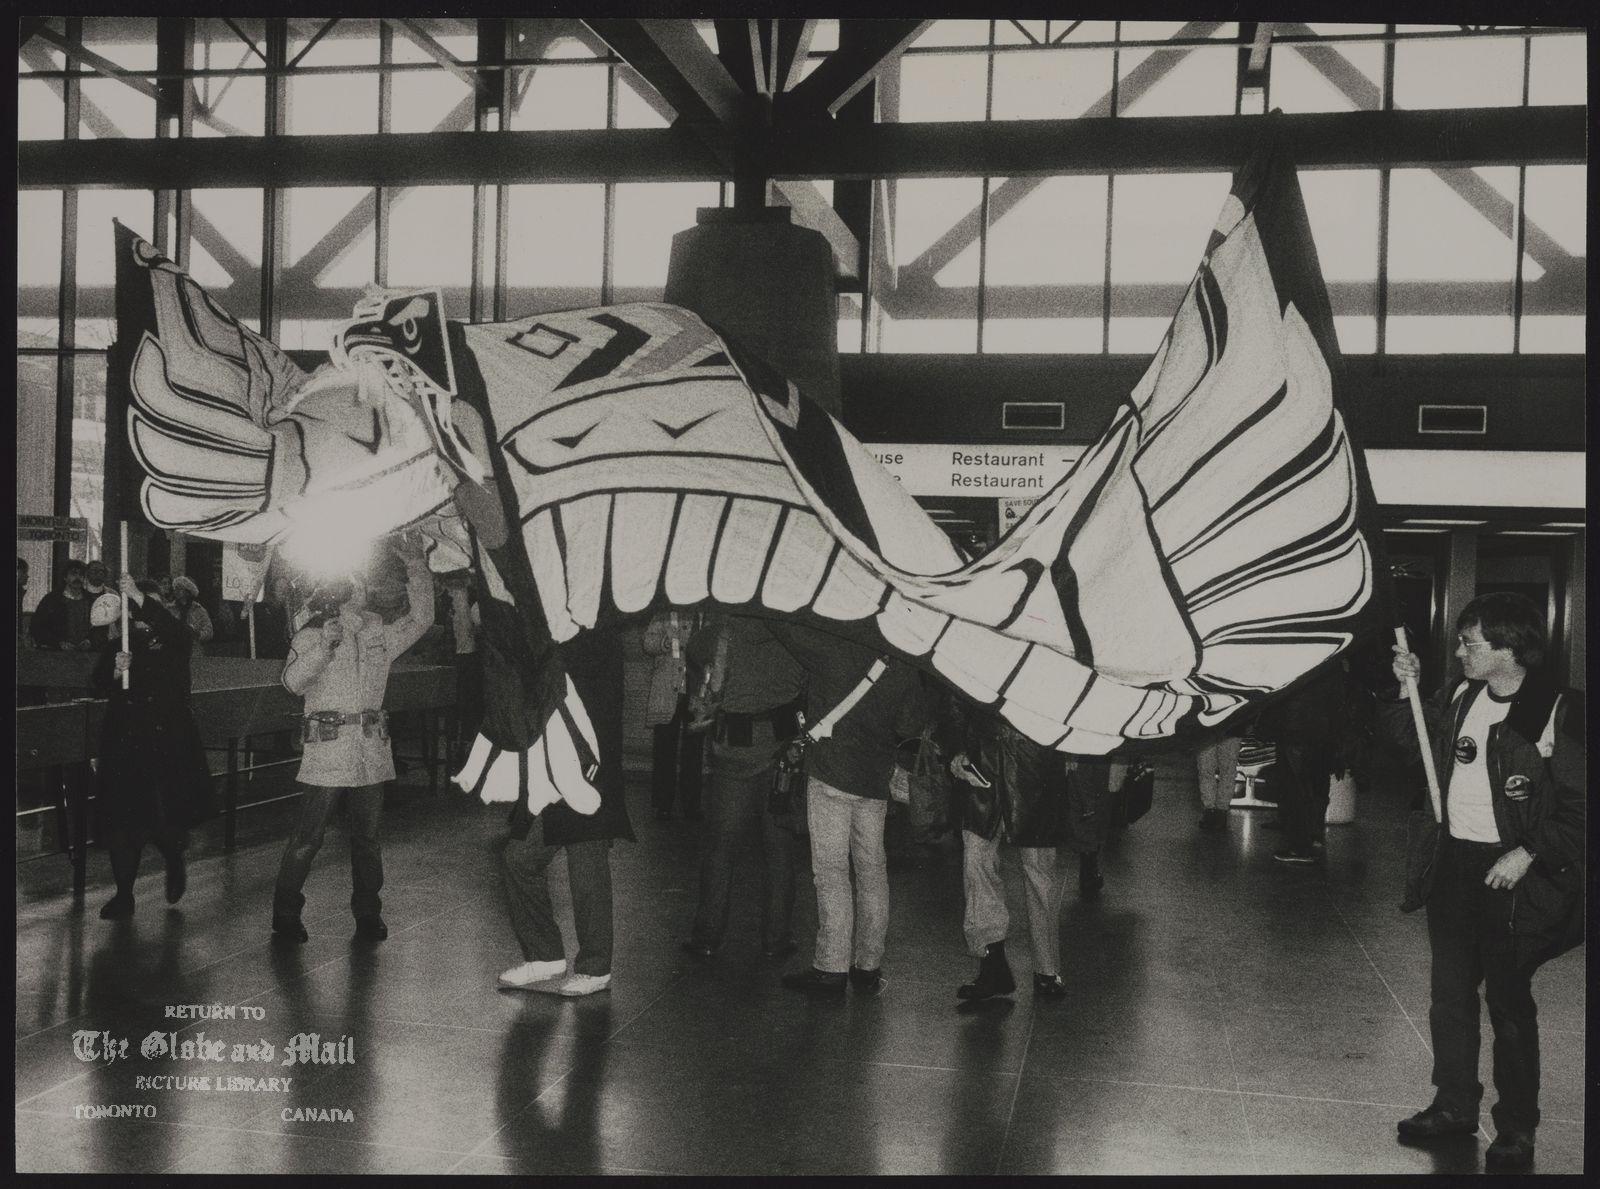 INDIANS Canada Haida Members of caravan hold aloft Haida eagle banner at Ottawa railway station yesterday.